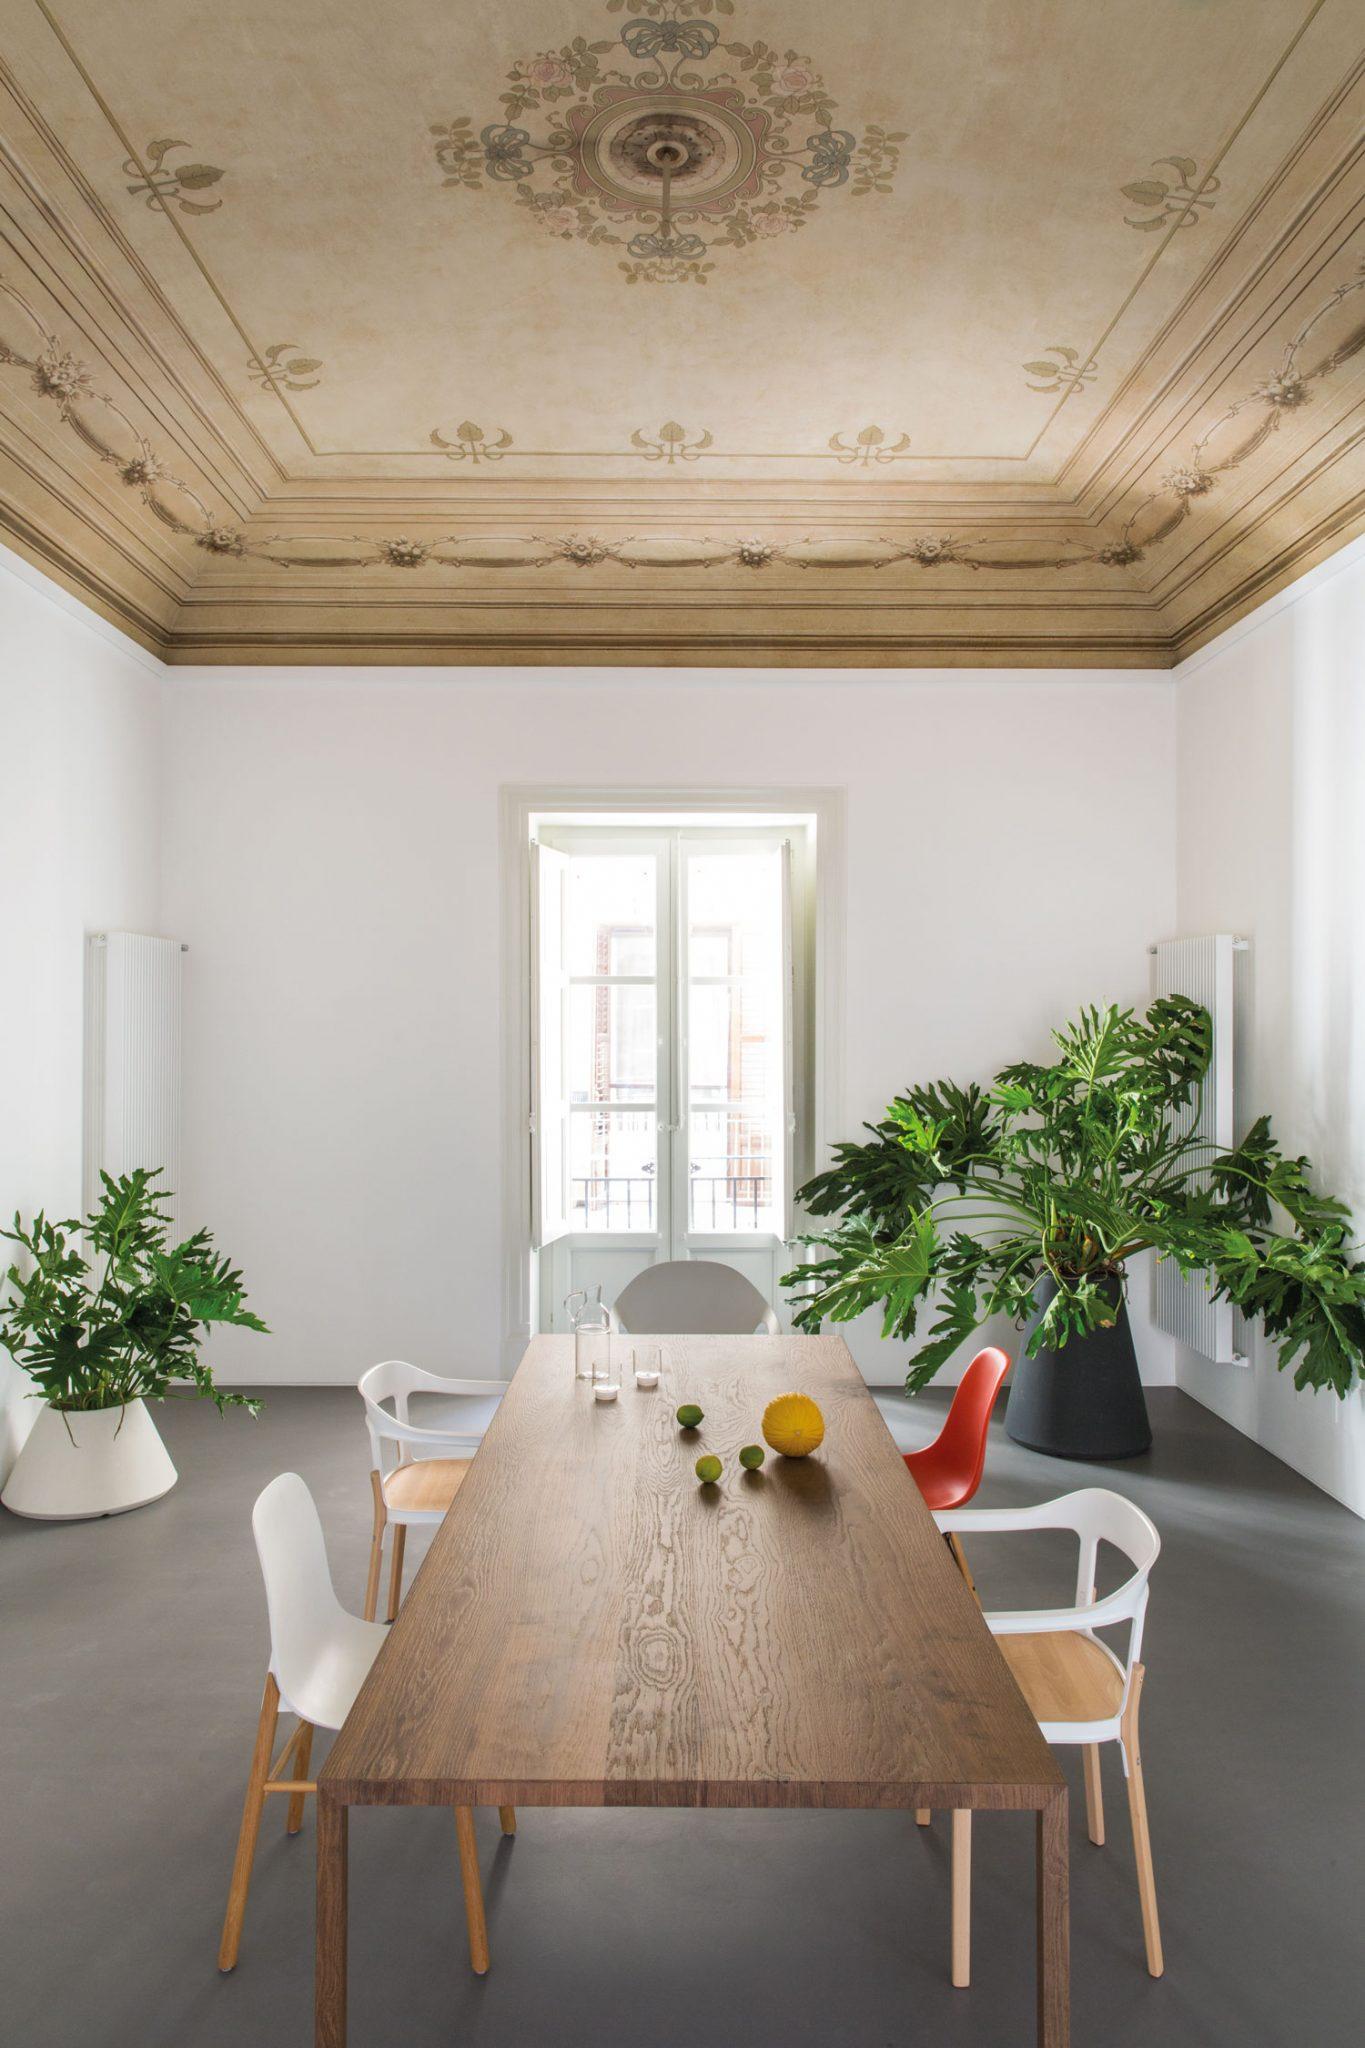 Greenbuilding magazine, Casa #A210, Palermo. Studio DiDeA Ph. © Serena Eller / Vega MG